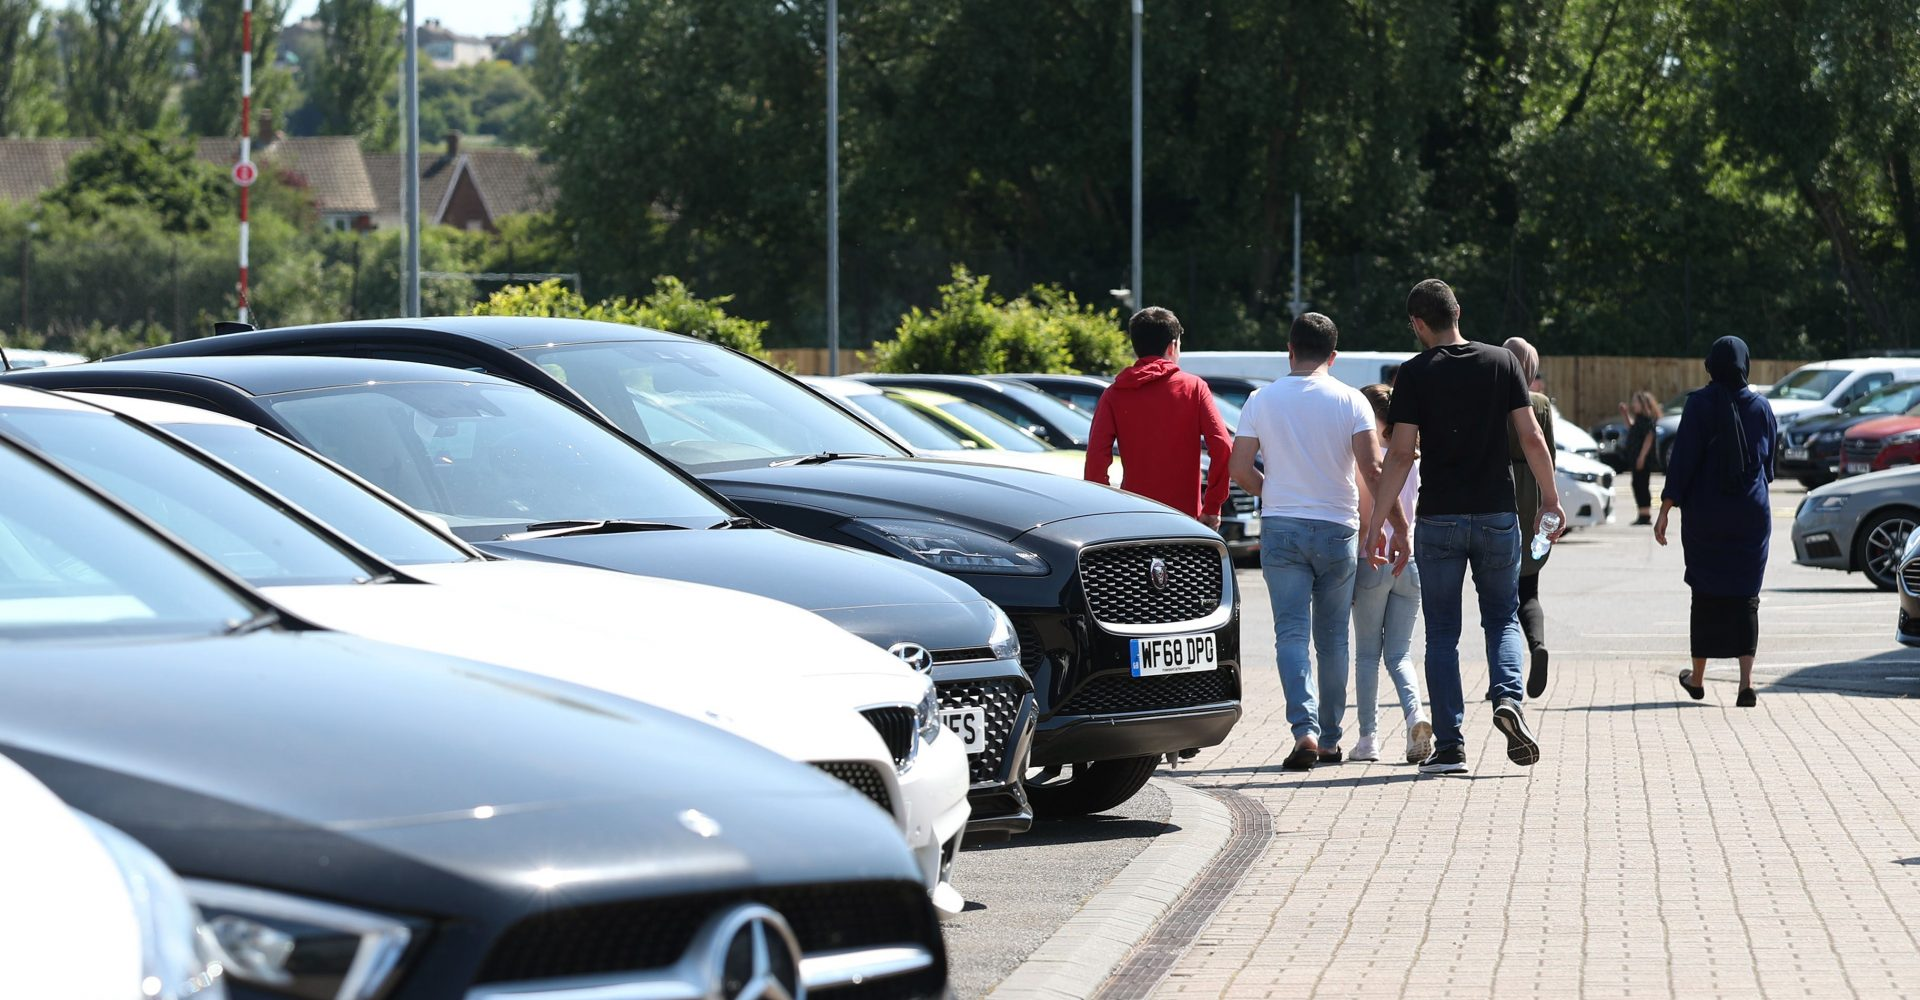 Motor finance market booming despite new lockdown